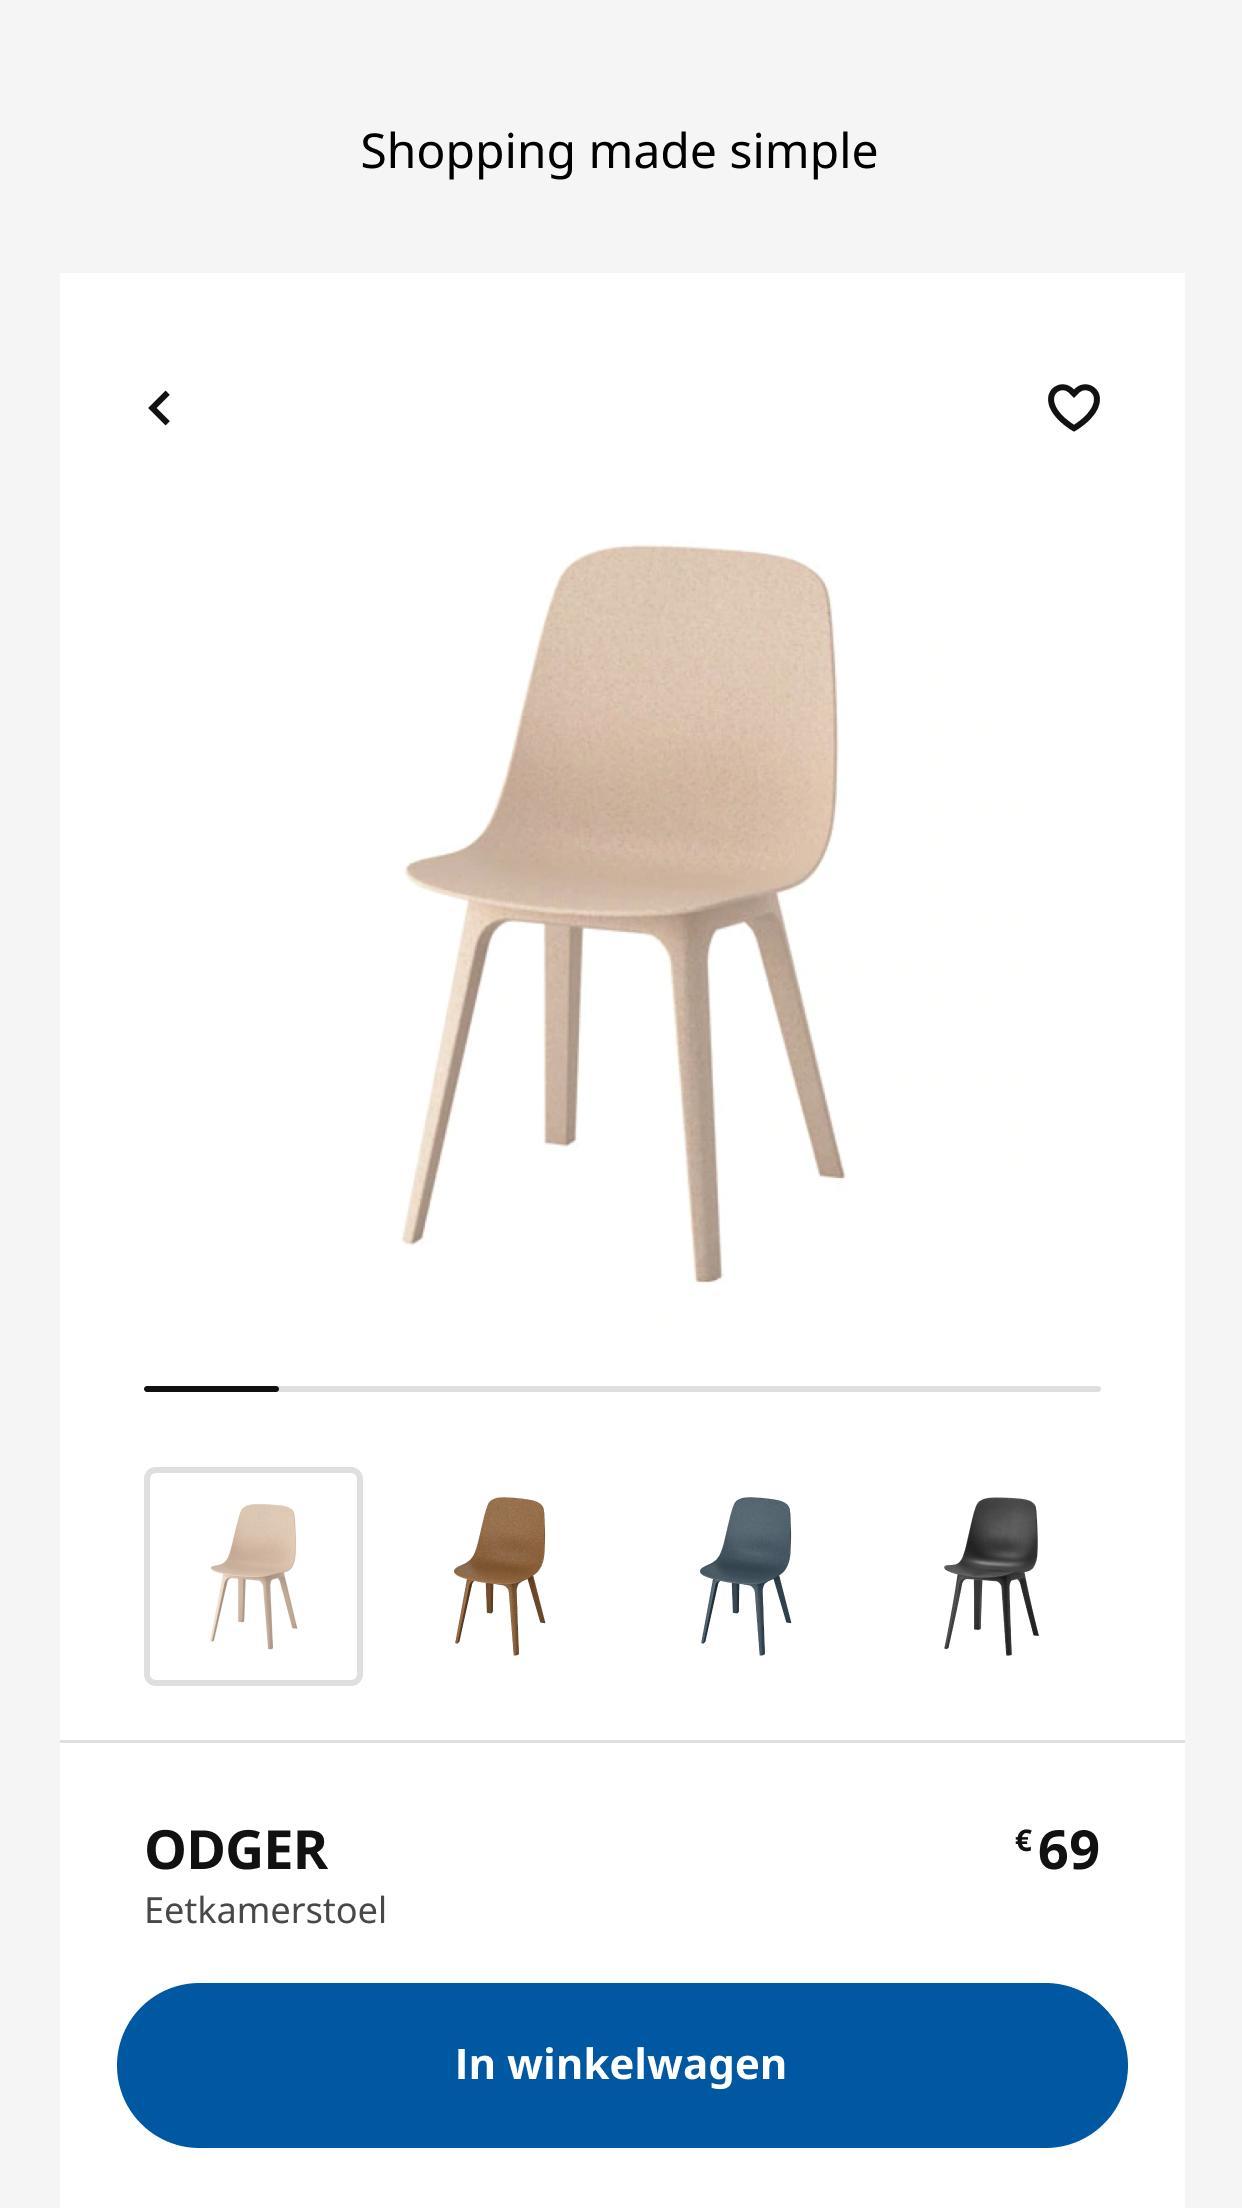 Eetkamer Stoel Ikea.Ikea For Android Apk Download